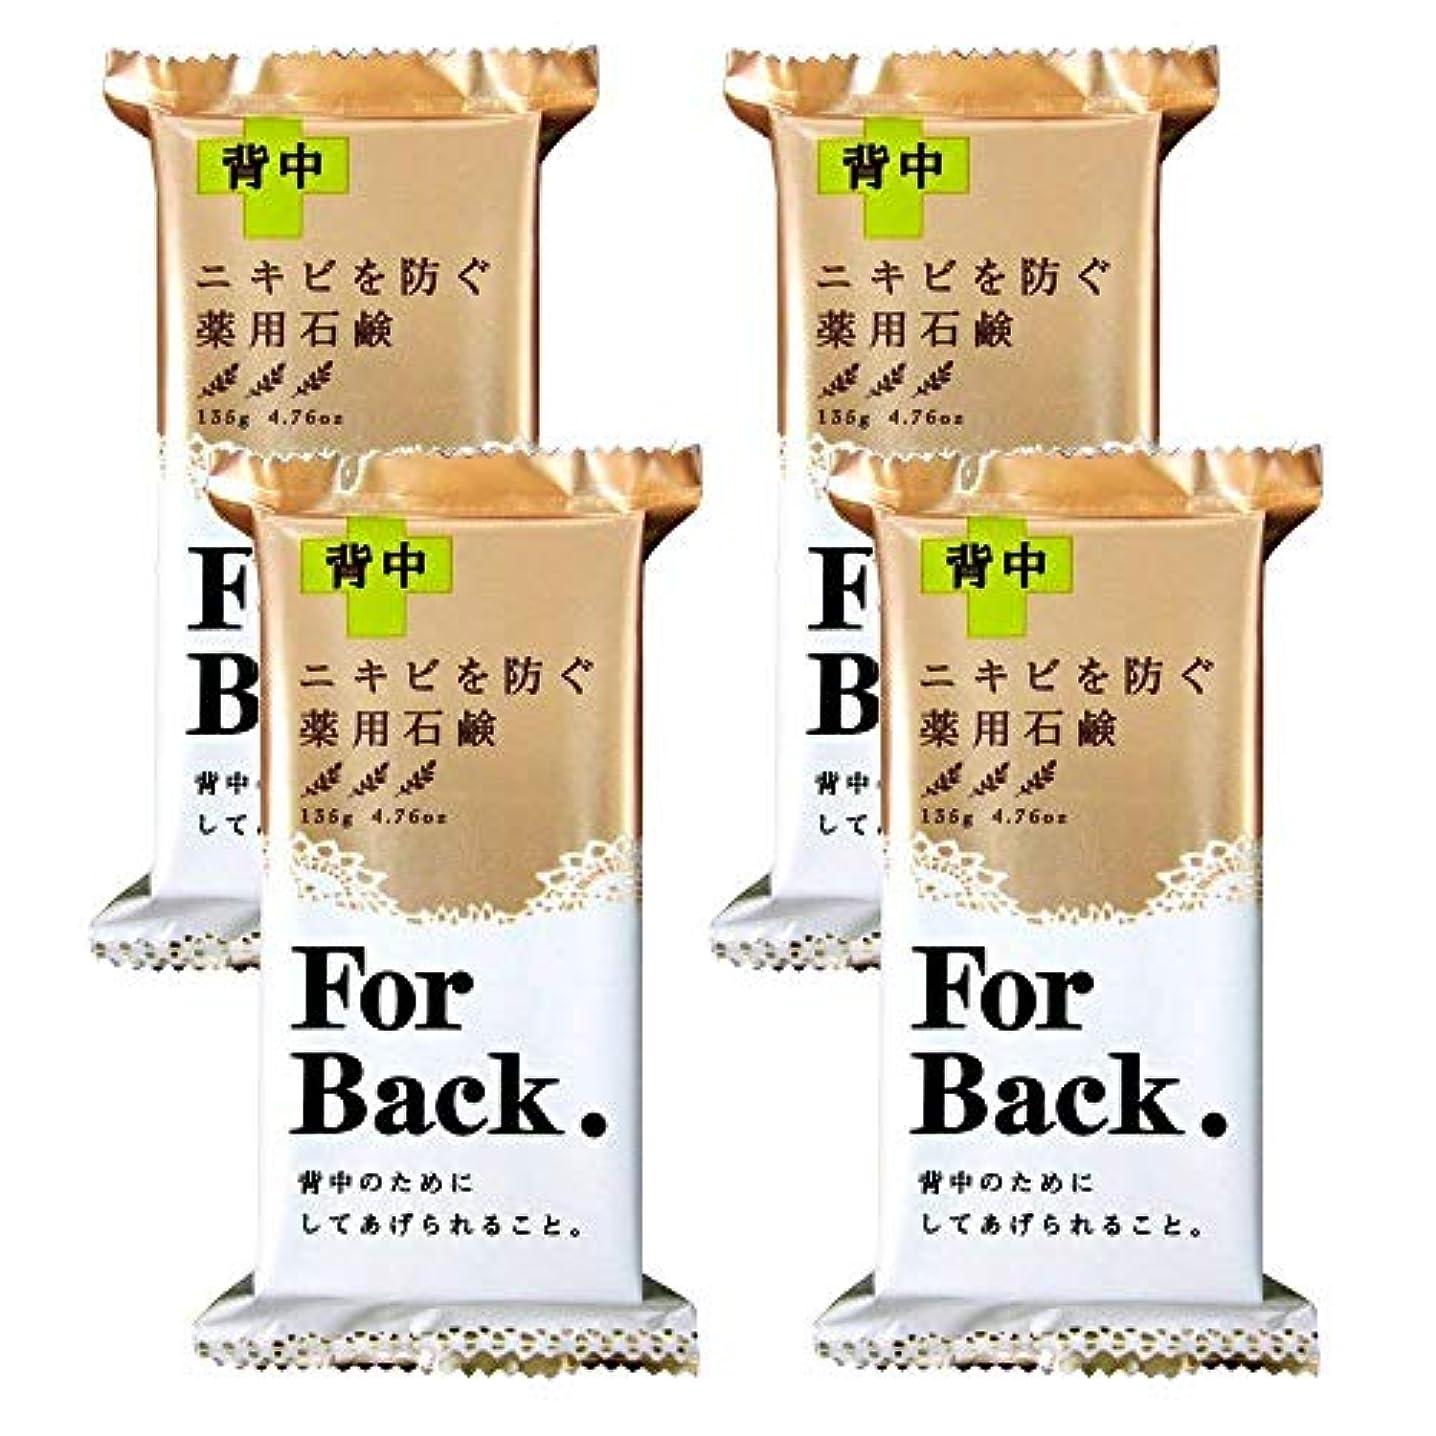 剛性謎食欲薬用石鹸 ForBack 135g×4個セット